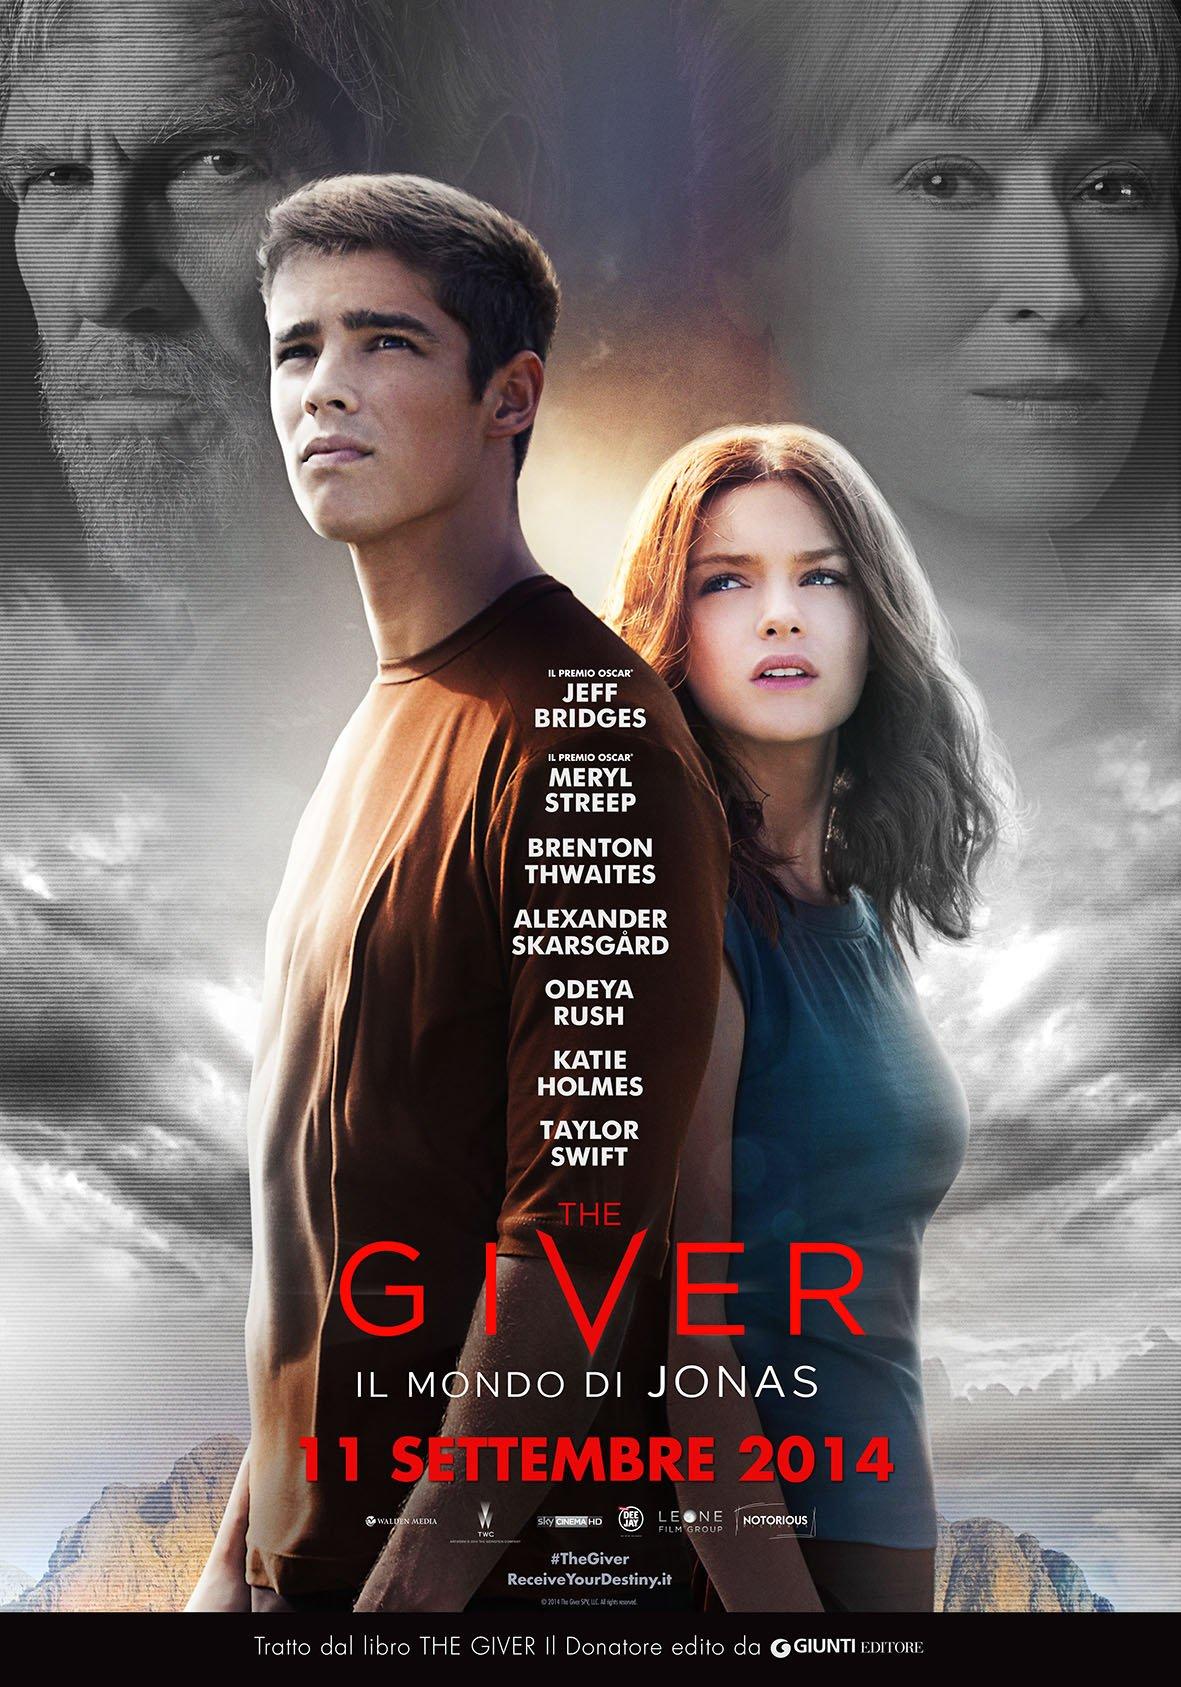 Davaoc (The Giver) 2014